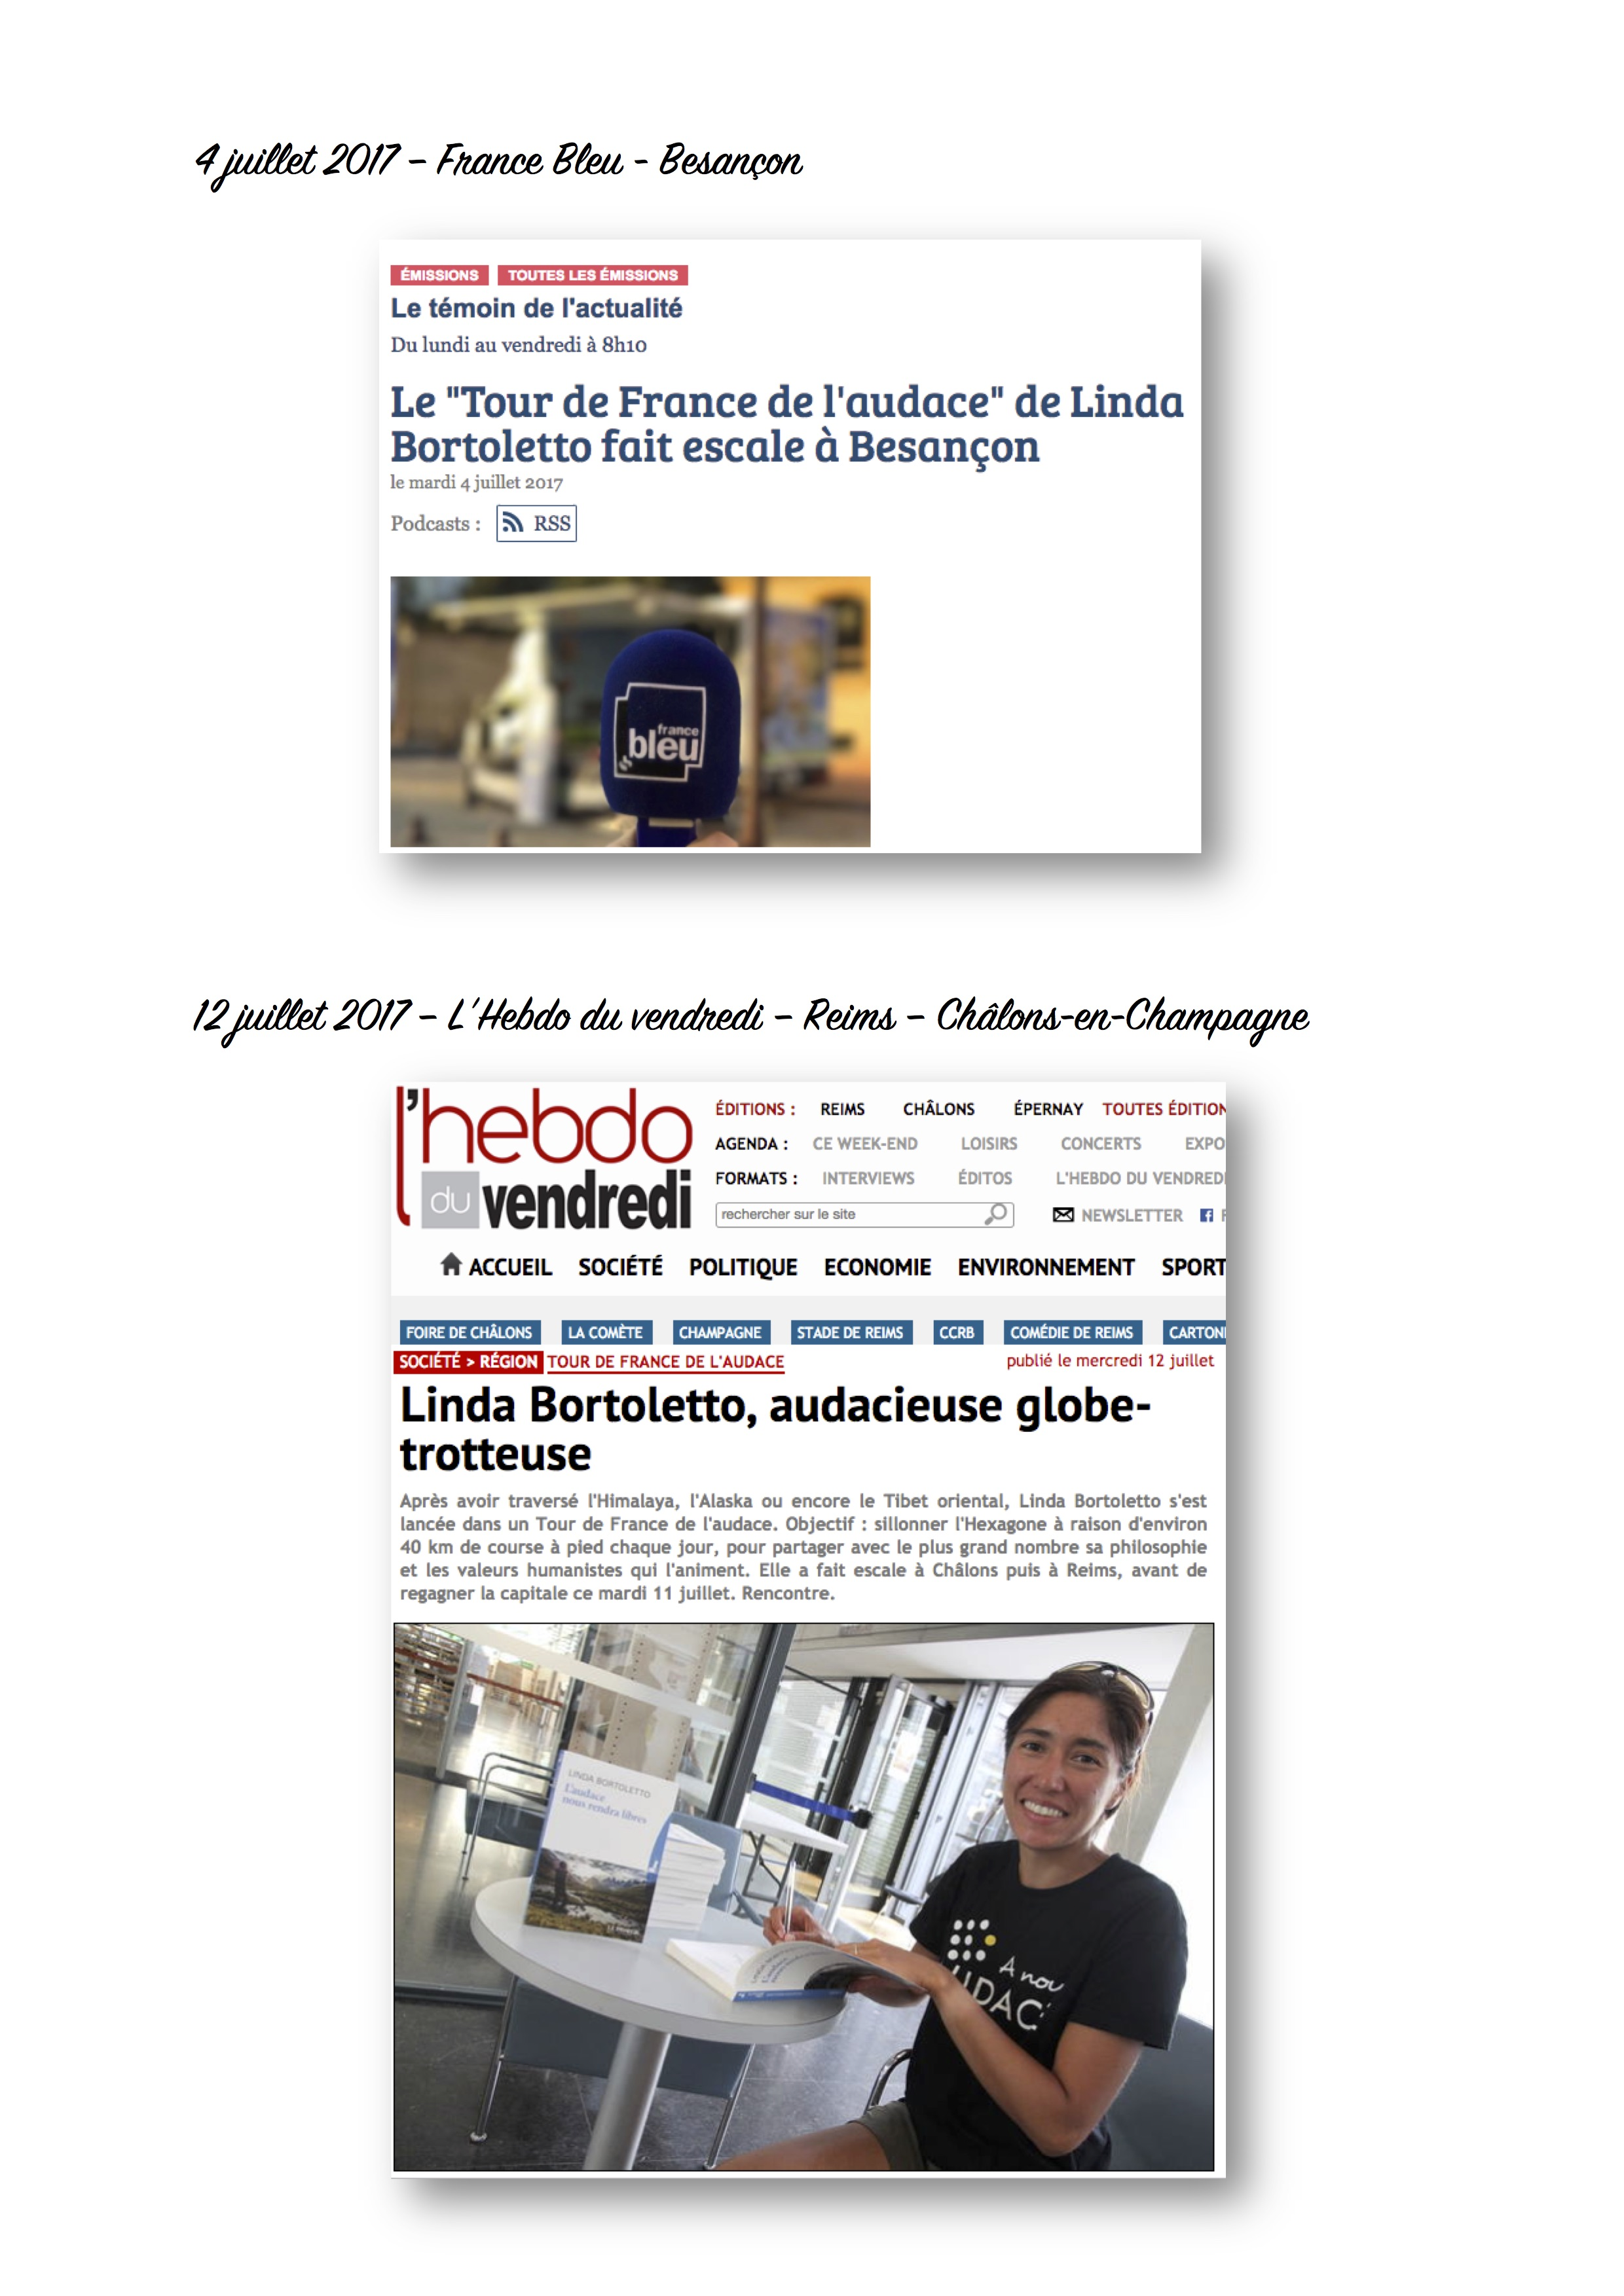 Revue de presse_TdF Audace_Web 8.jpg